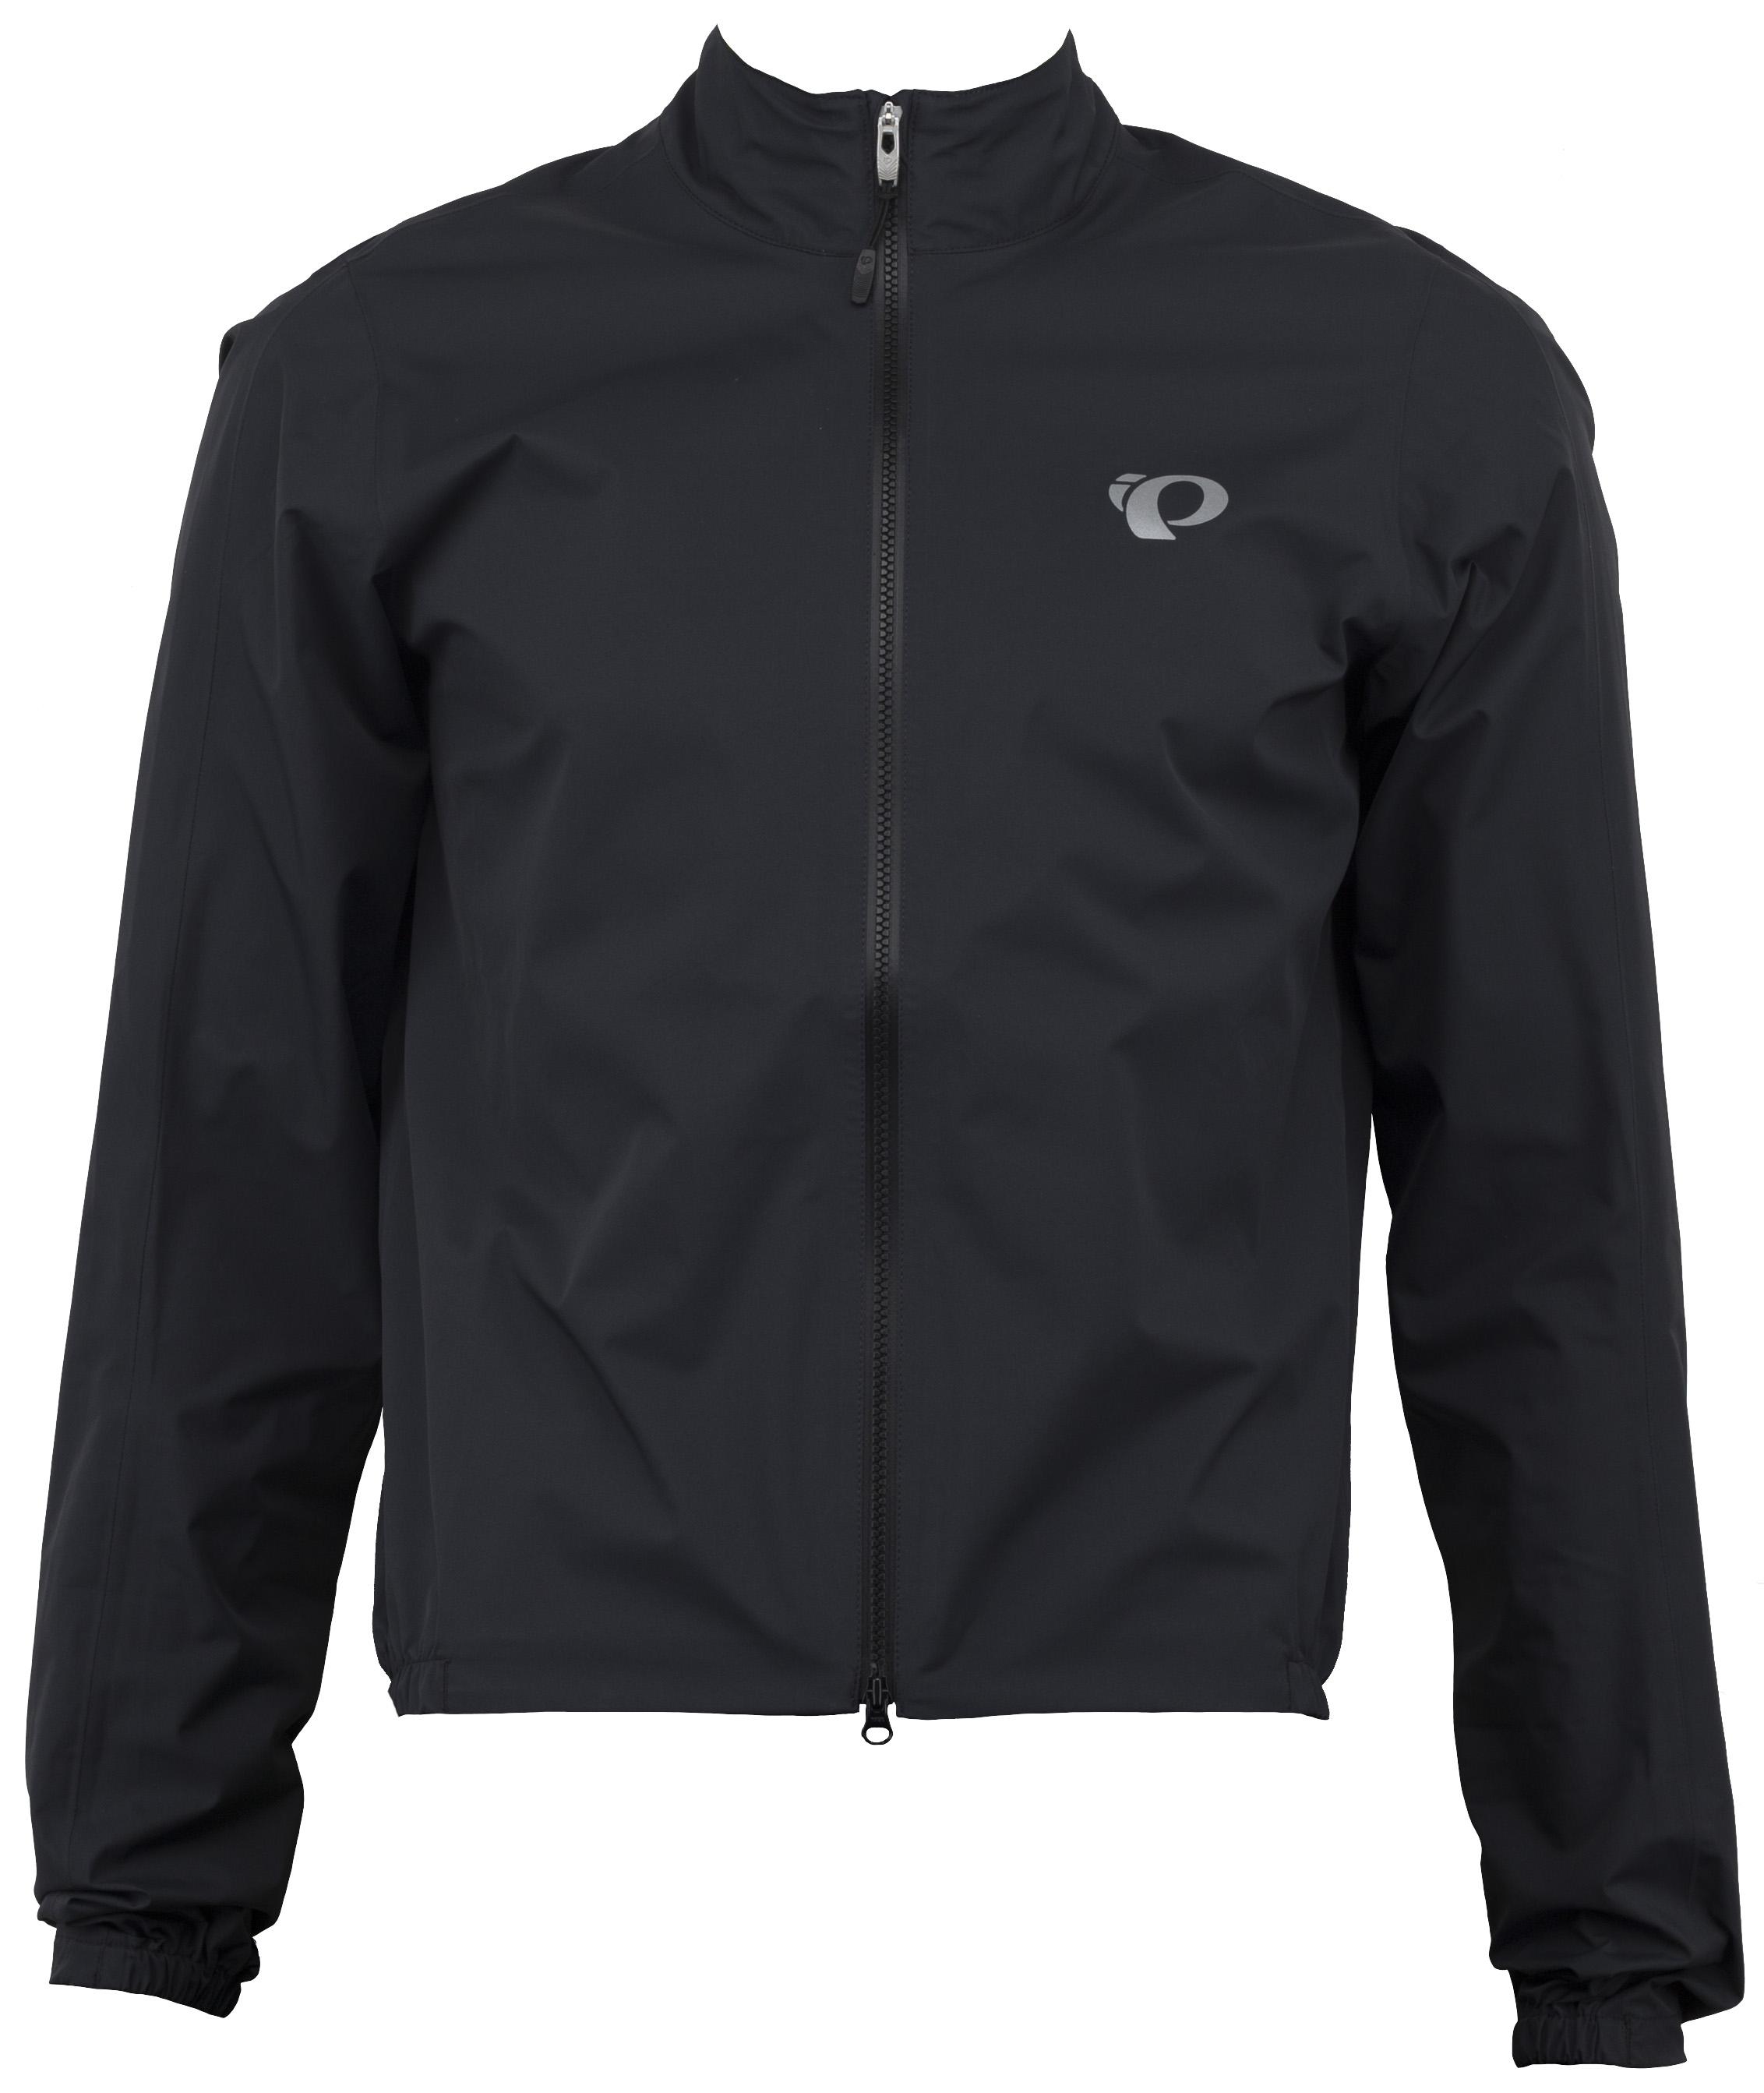 Pearl Izumi Elite Wxb Jacket Men's Size Small in Black